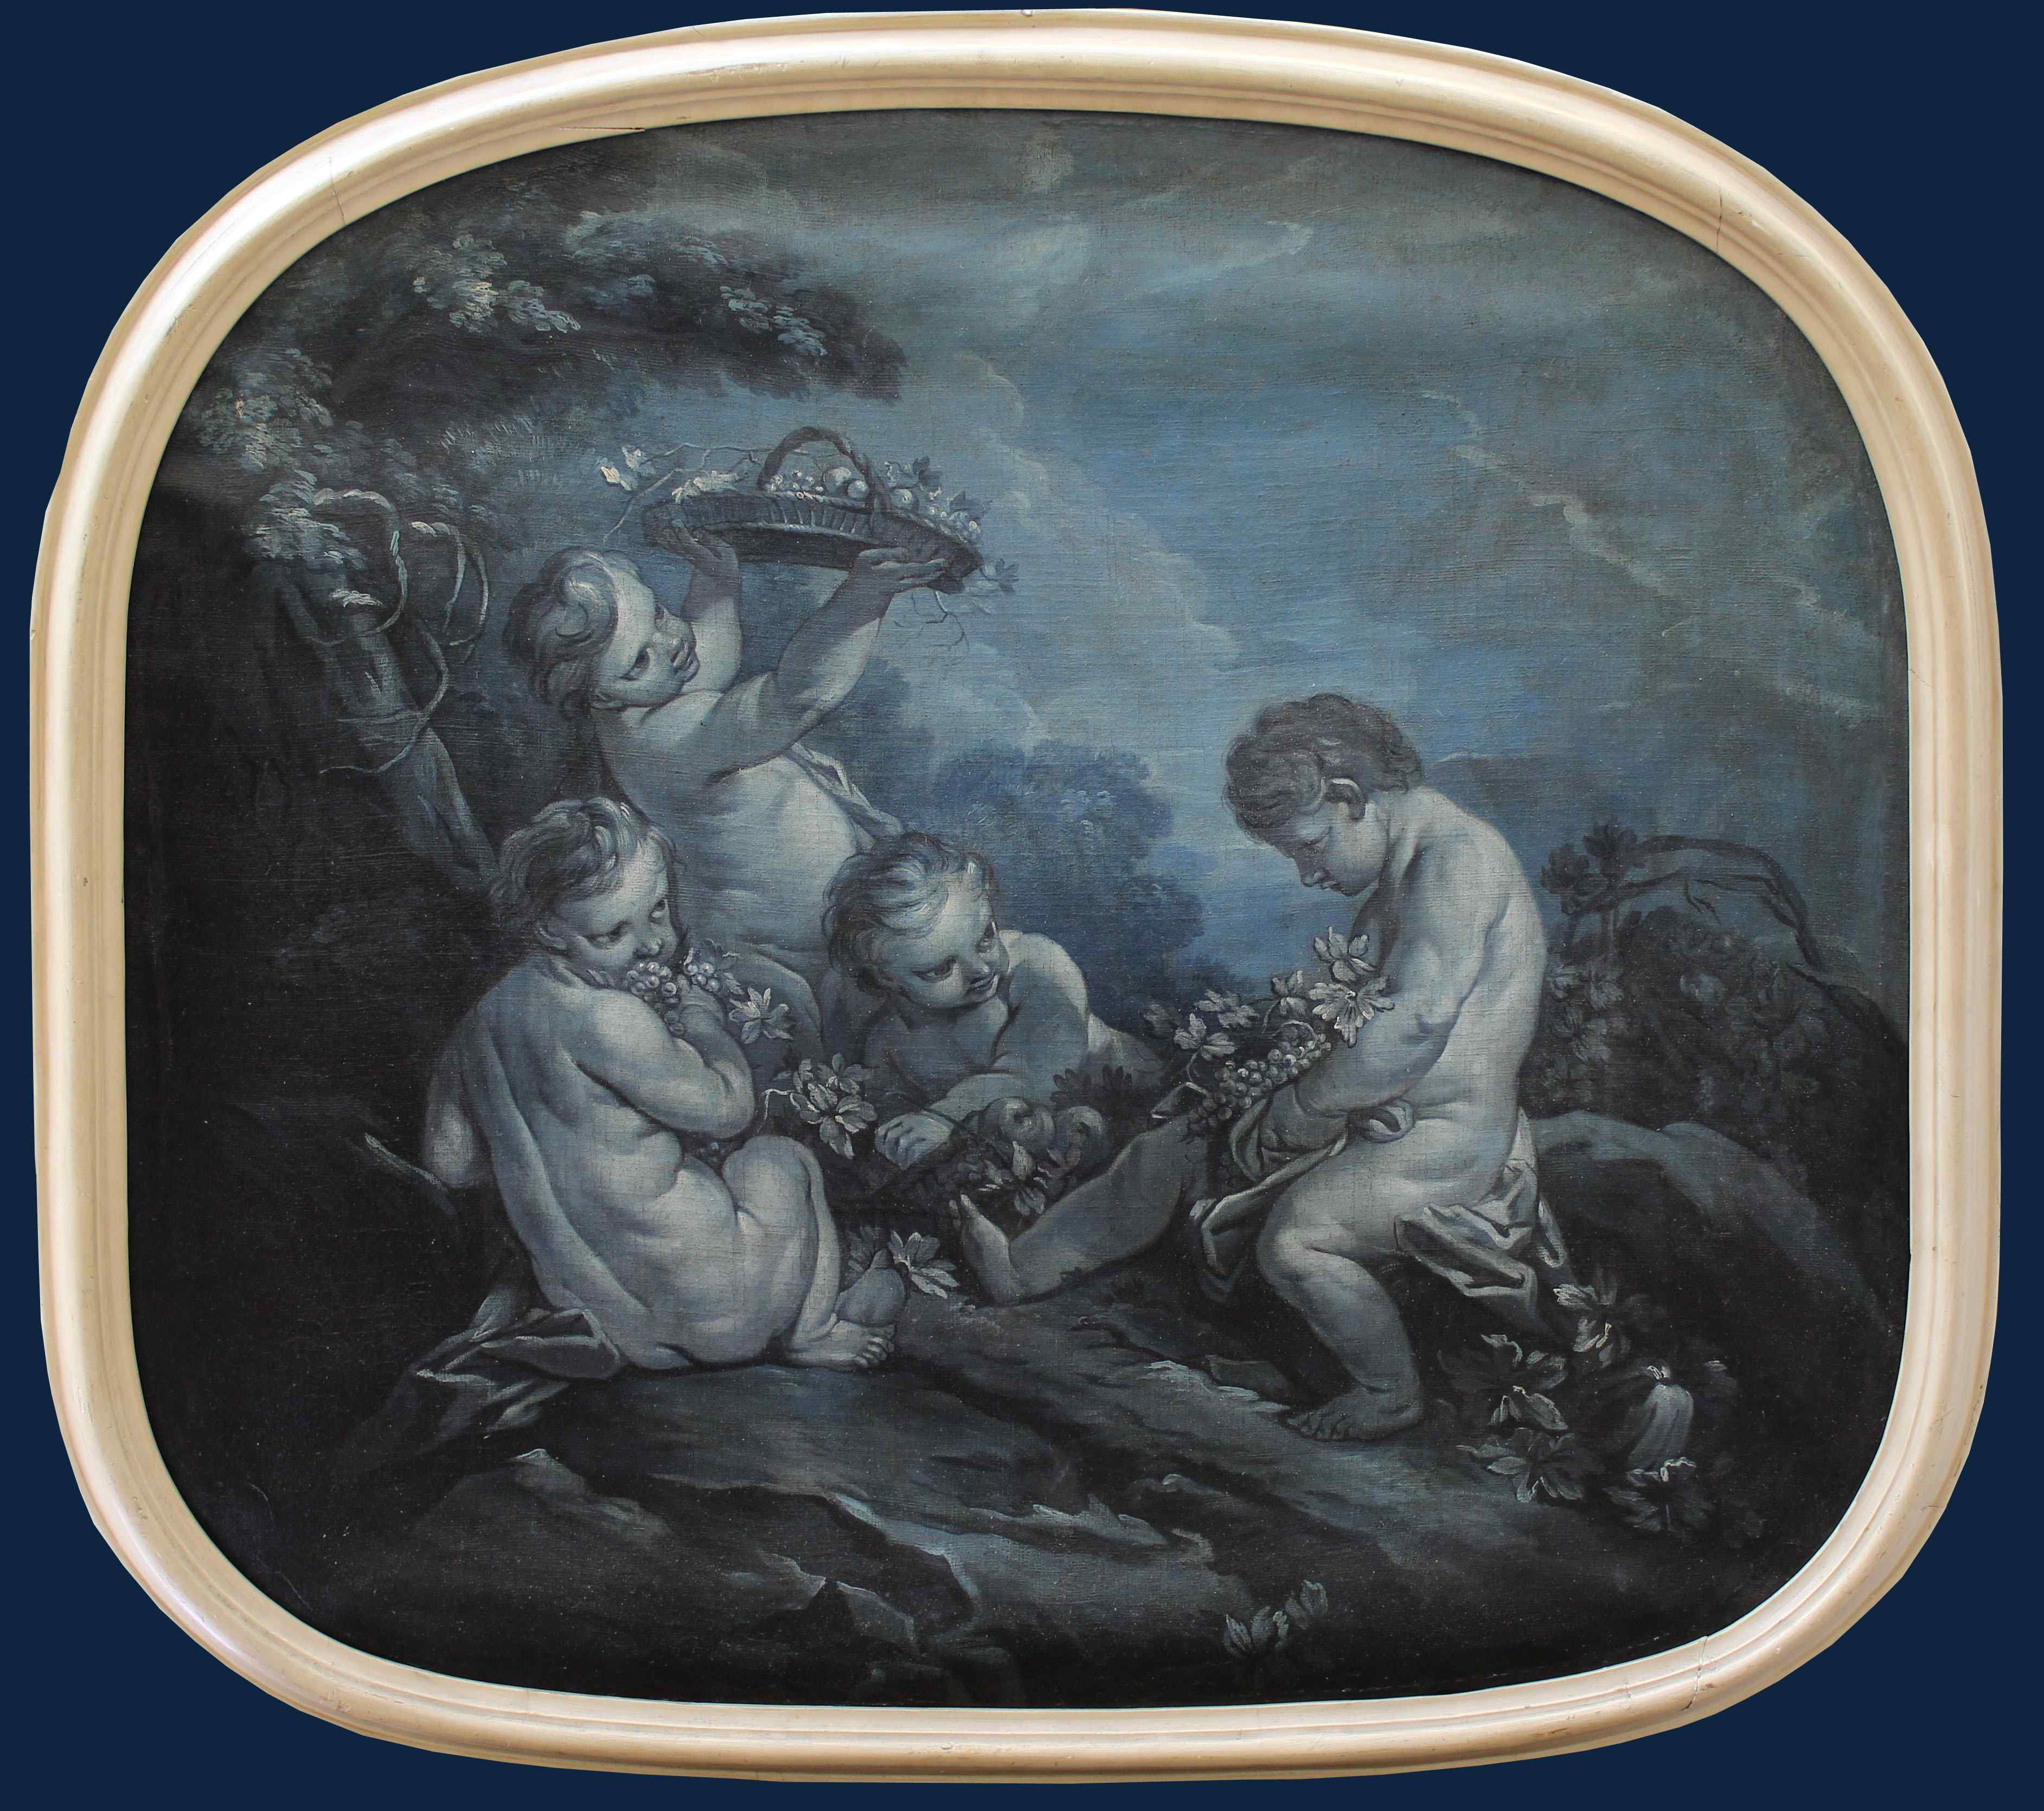 Cerchia di F. Boucher 1703 , 1770 Putti Grisaille